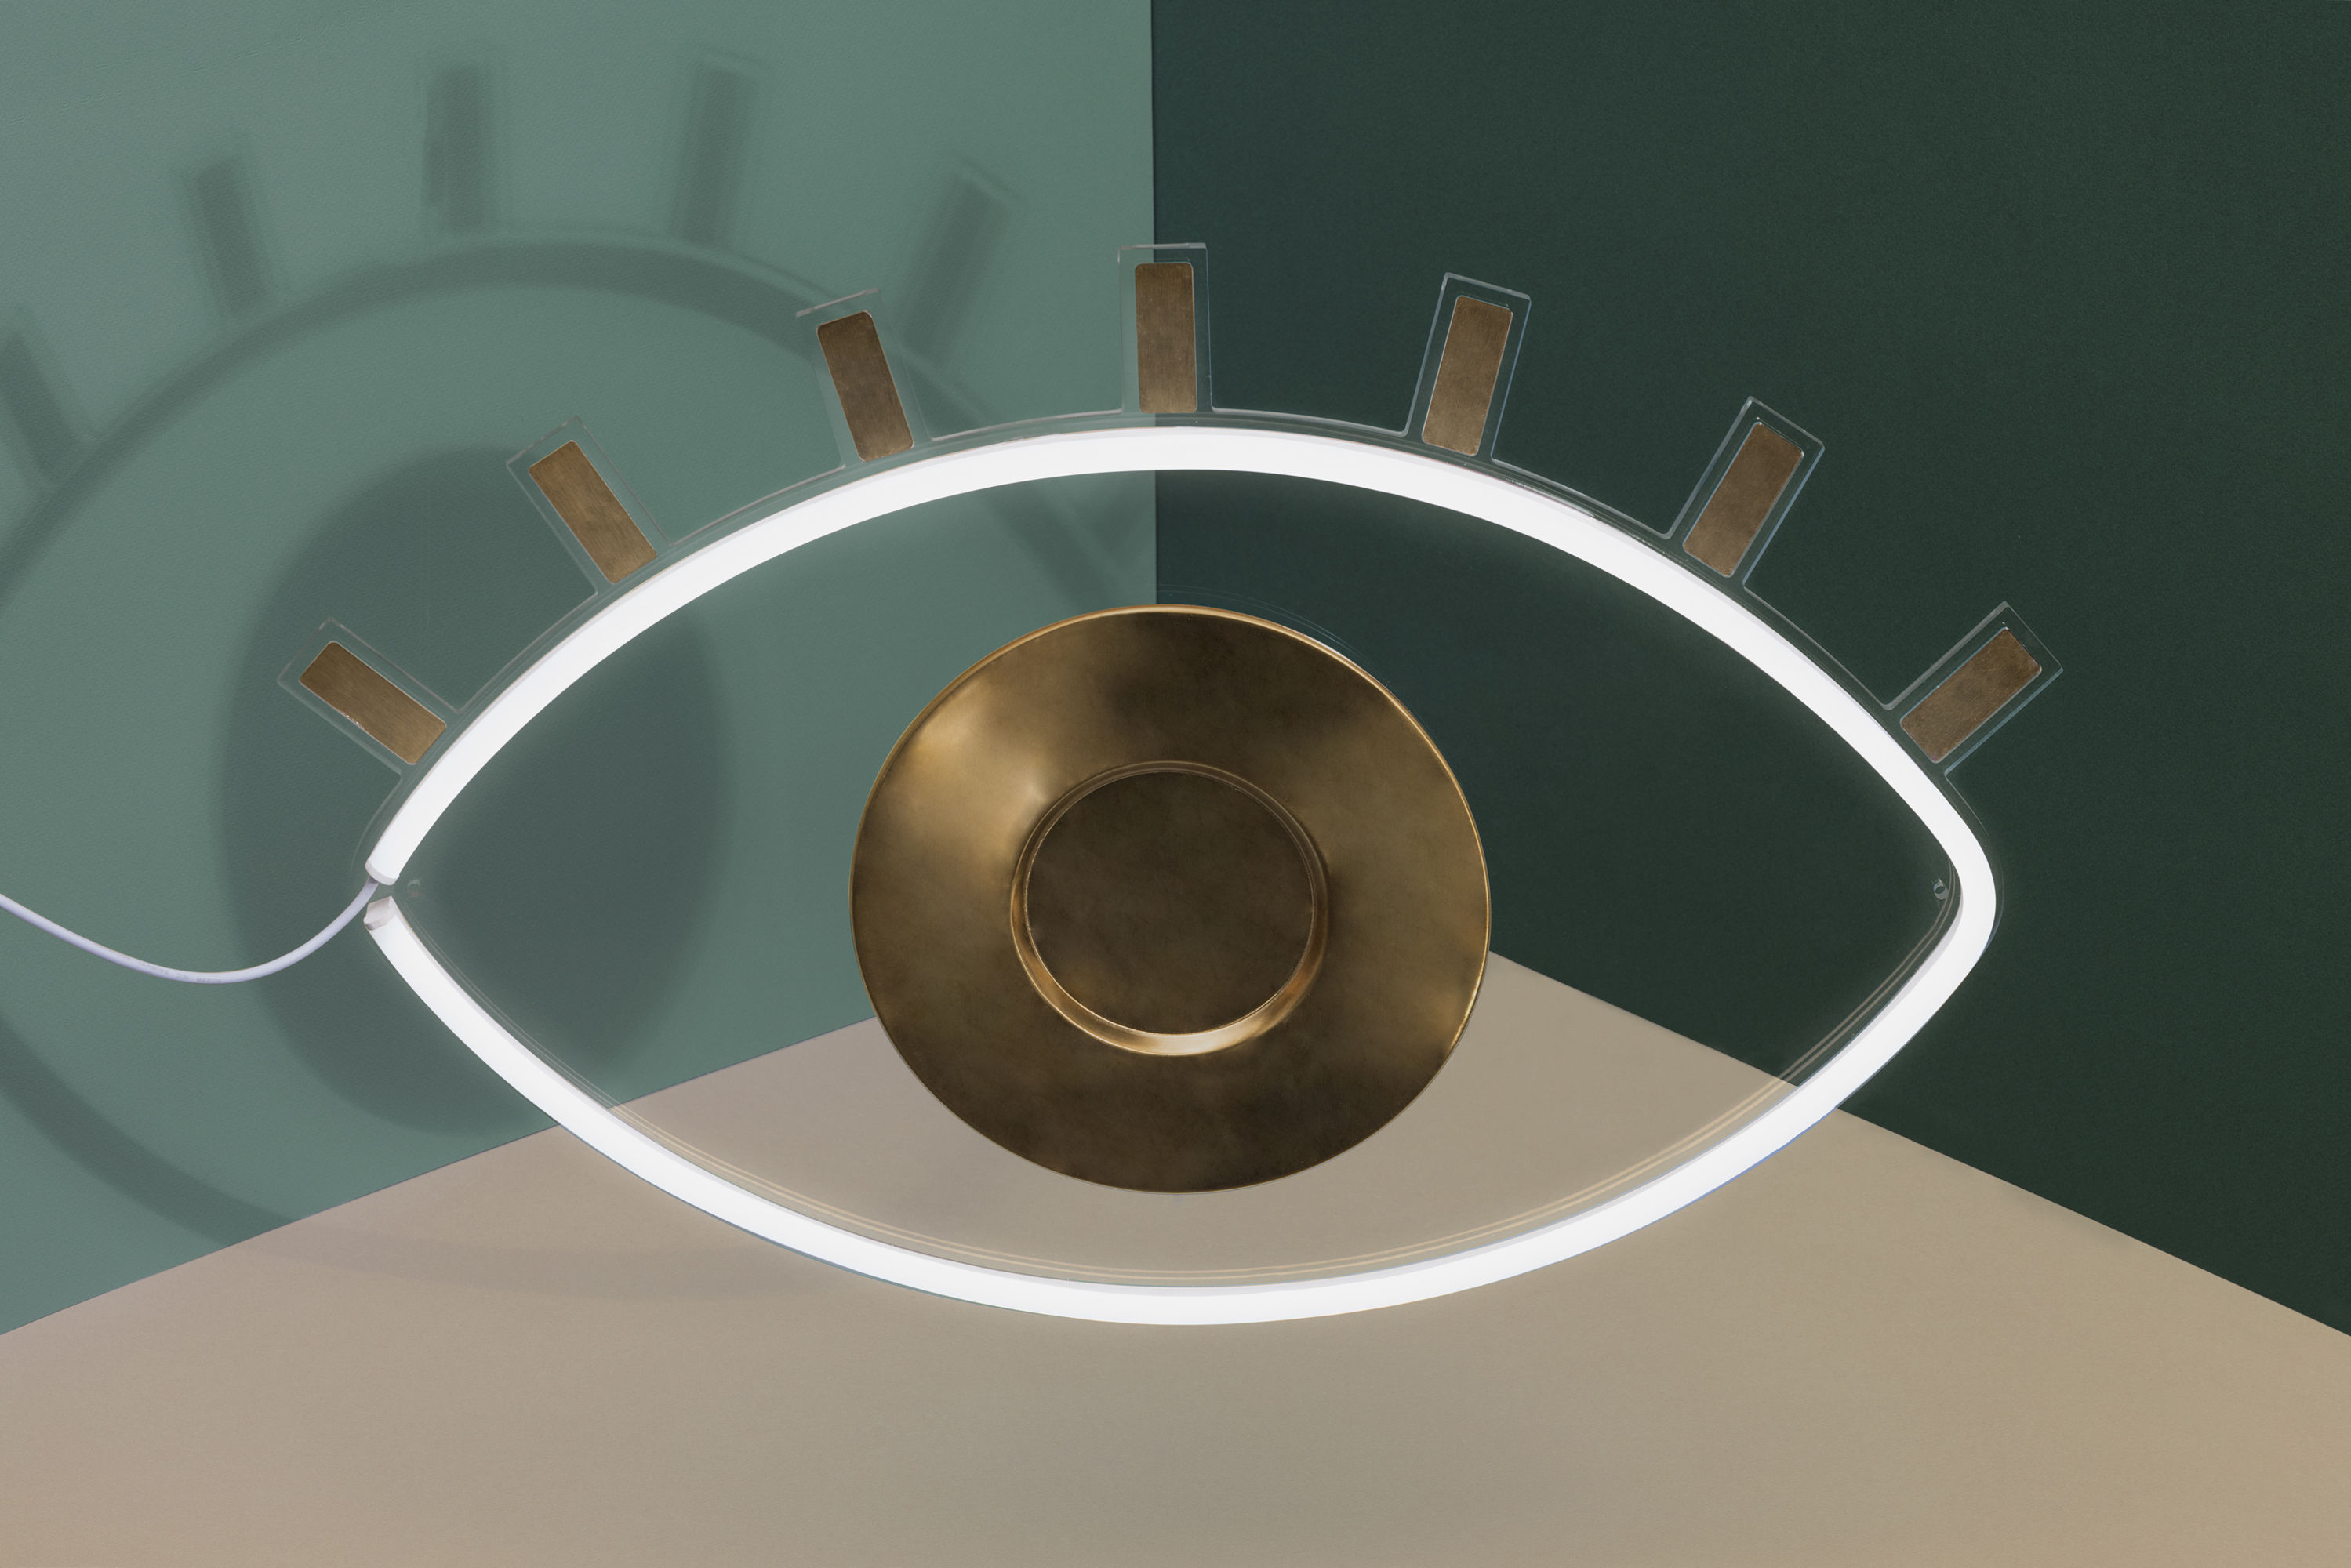 applique avec prise oculus doiy blanc laiton l 60 x h 40 made in design. Black Bedroom Furniture Sets. Home Design Ideas